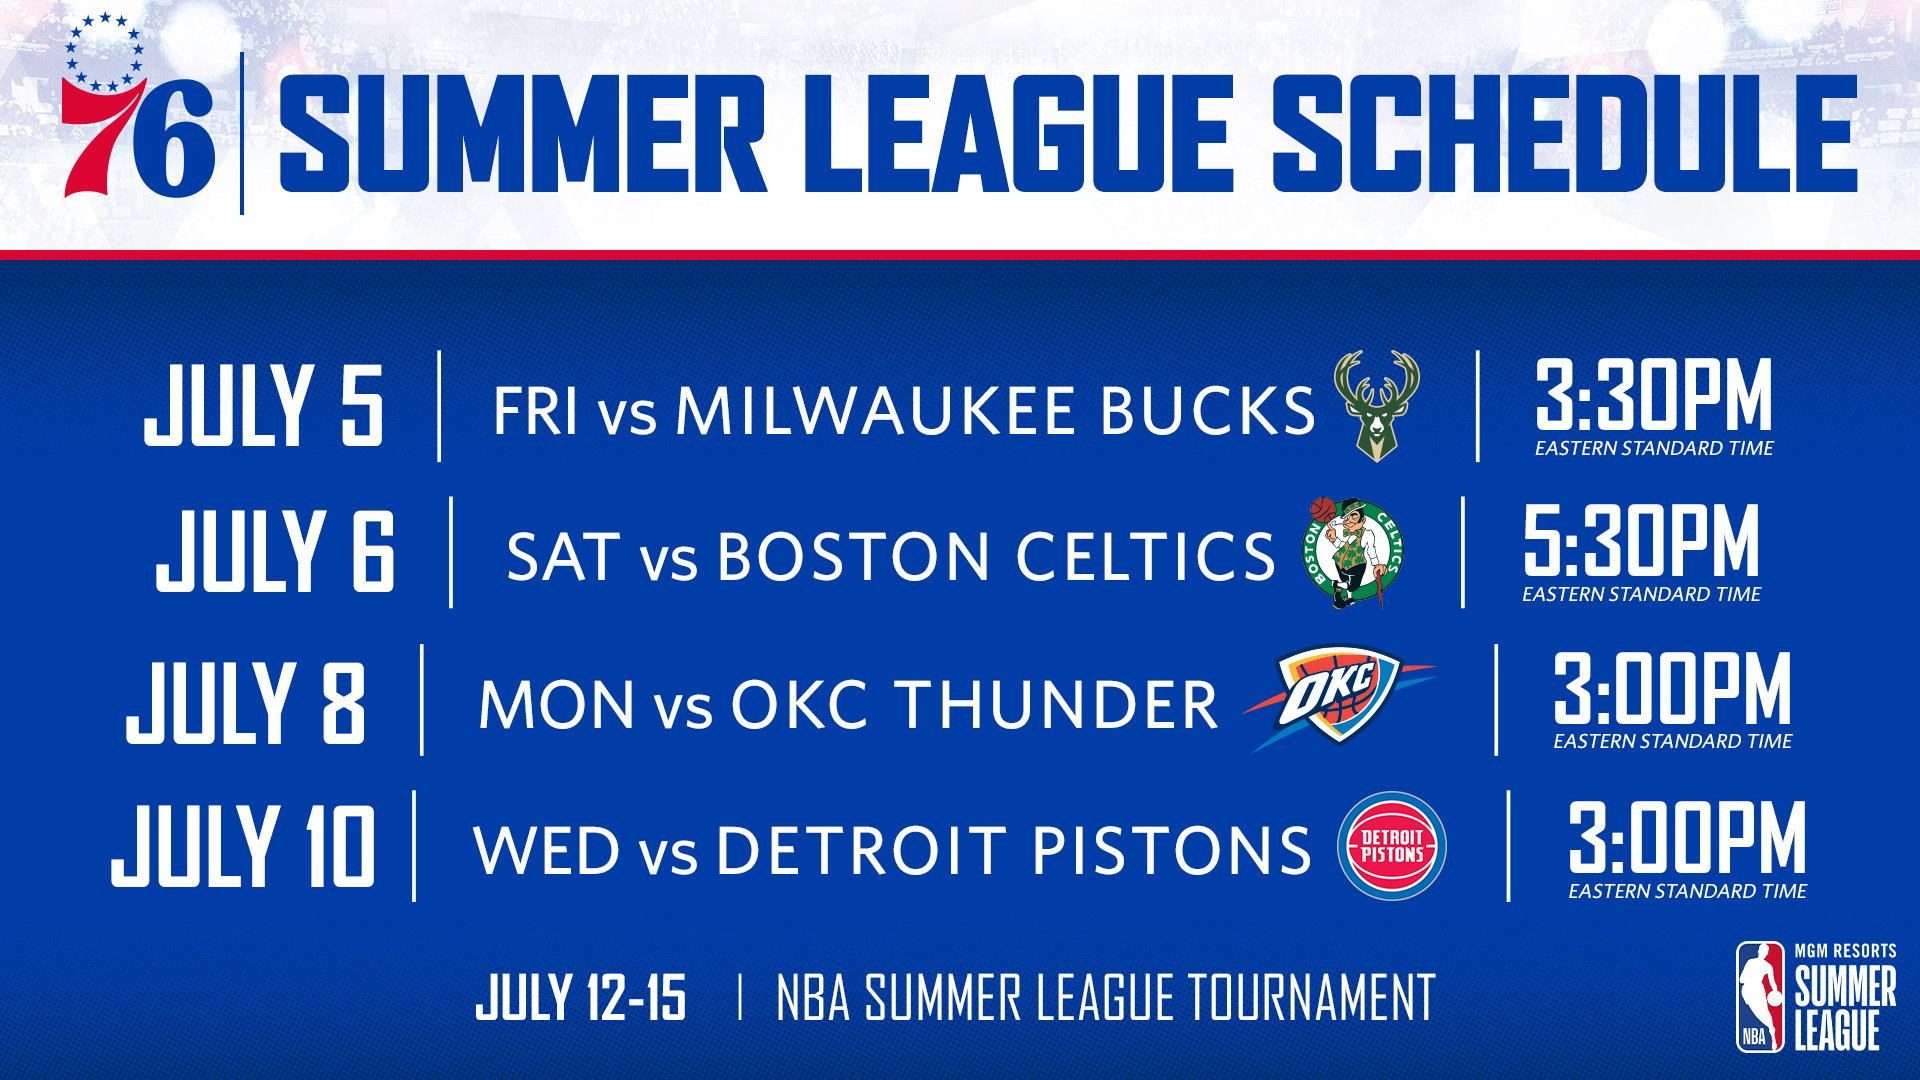 Nba Announces Schedule For 2019 Summer League   Philadelphia 76Ers 76Ers Calendar 2019